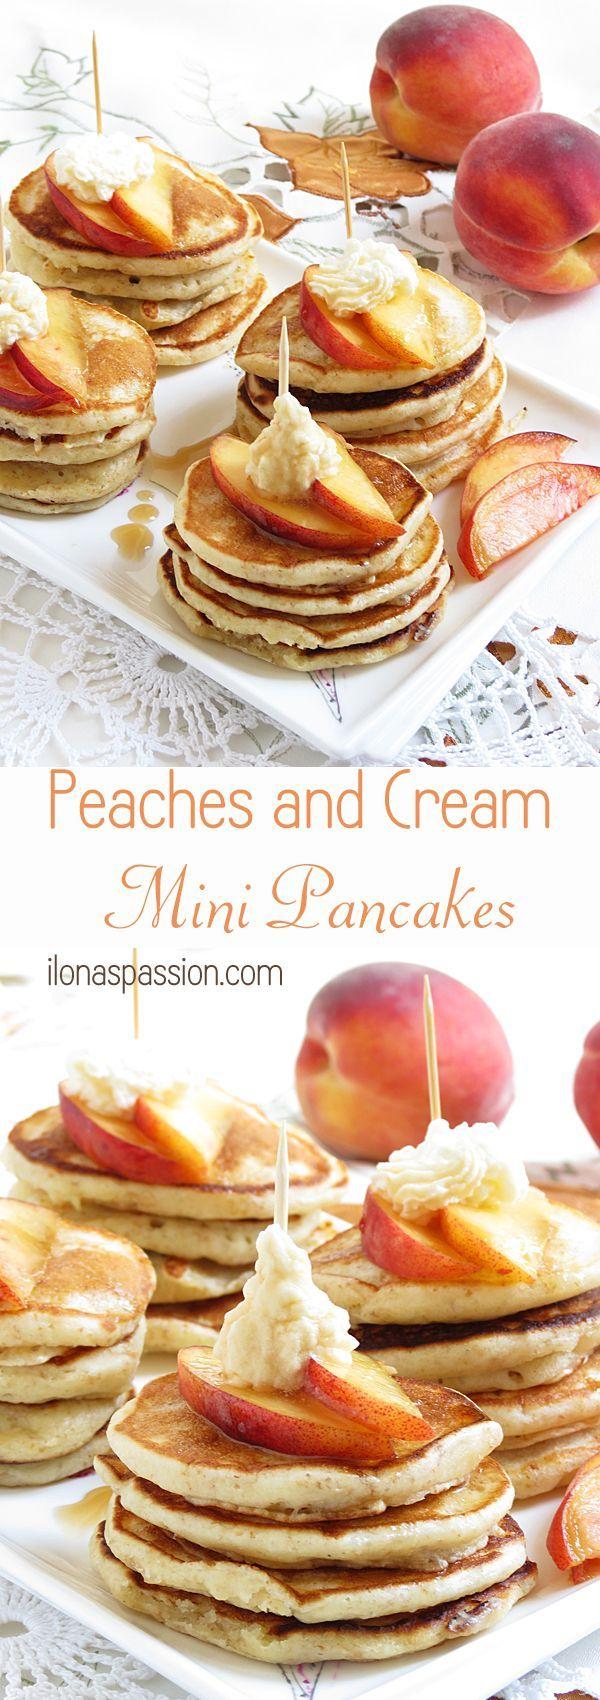 Peaches and Cream Mini Pancakes by http://ilonaspassion.com #pancakes #peachesandcream #teaparty